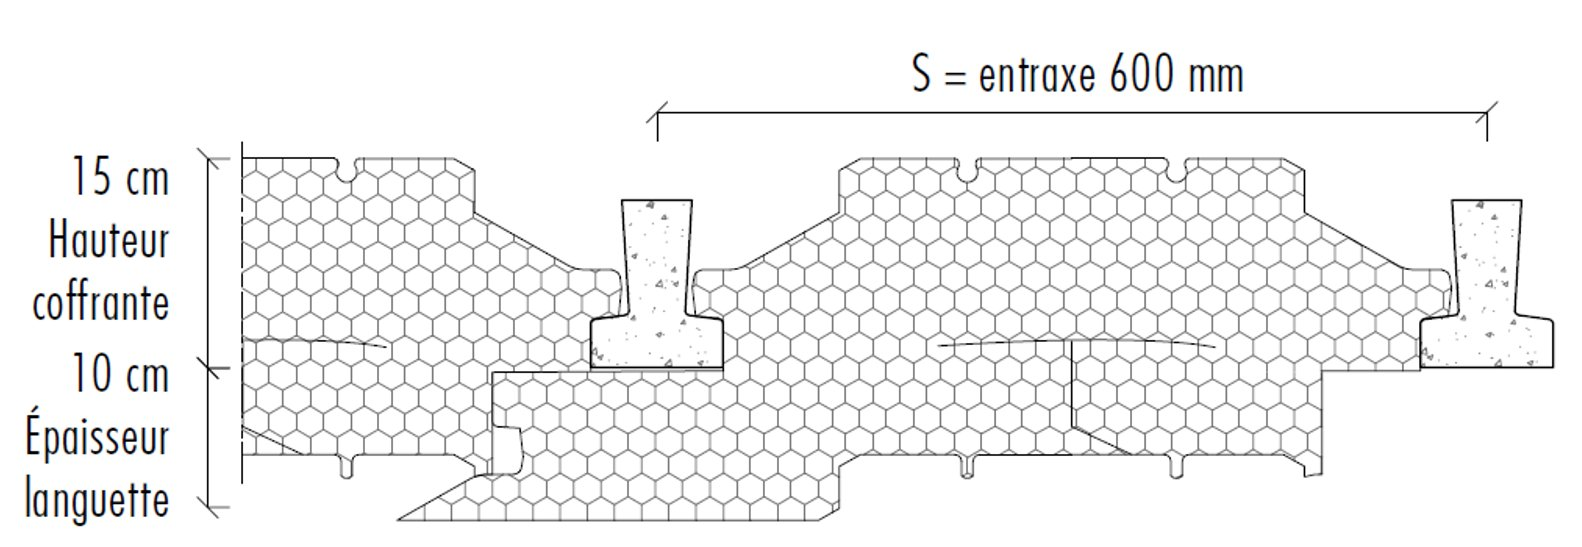 knauf hourdiversel a a se entrevous isolant en vide sanitaire knauf b timent. Black Bedroom Furniture Sets. Home Design Ideas